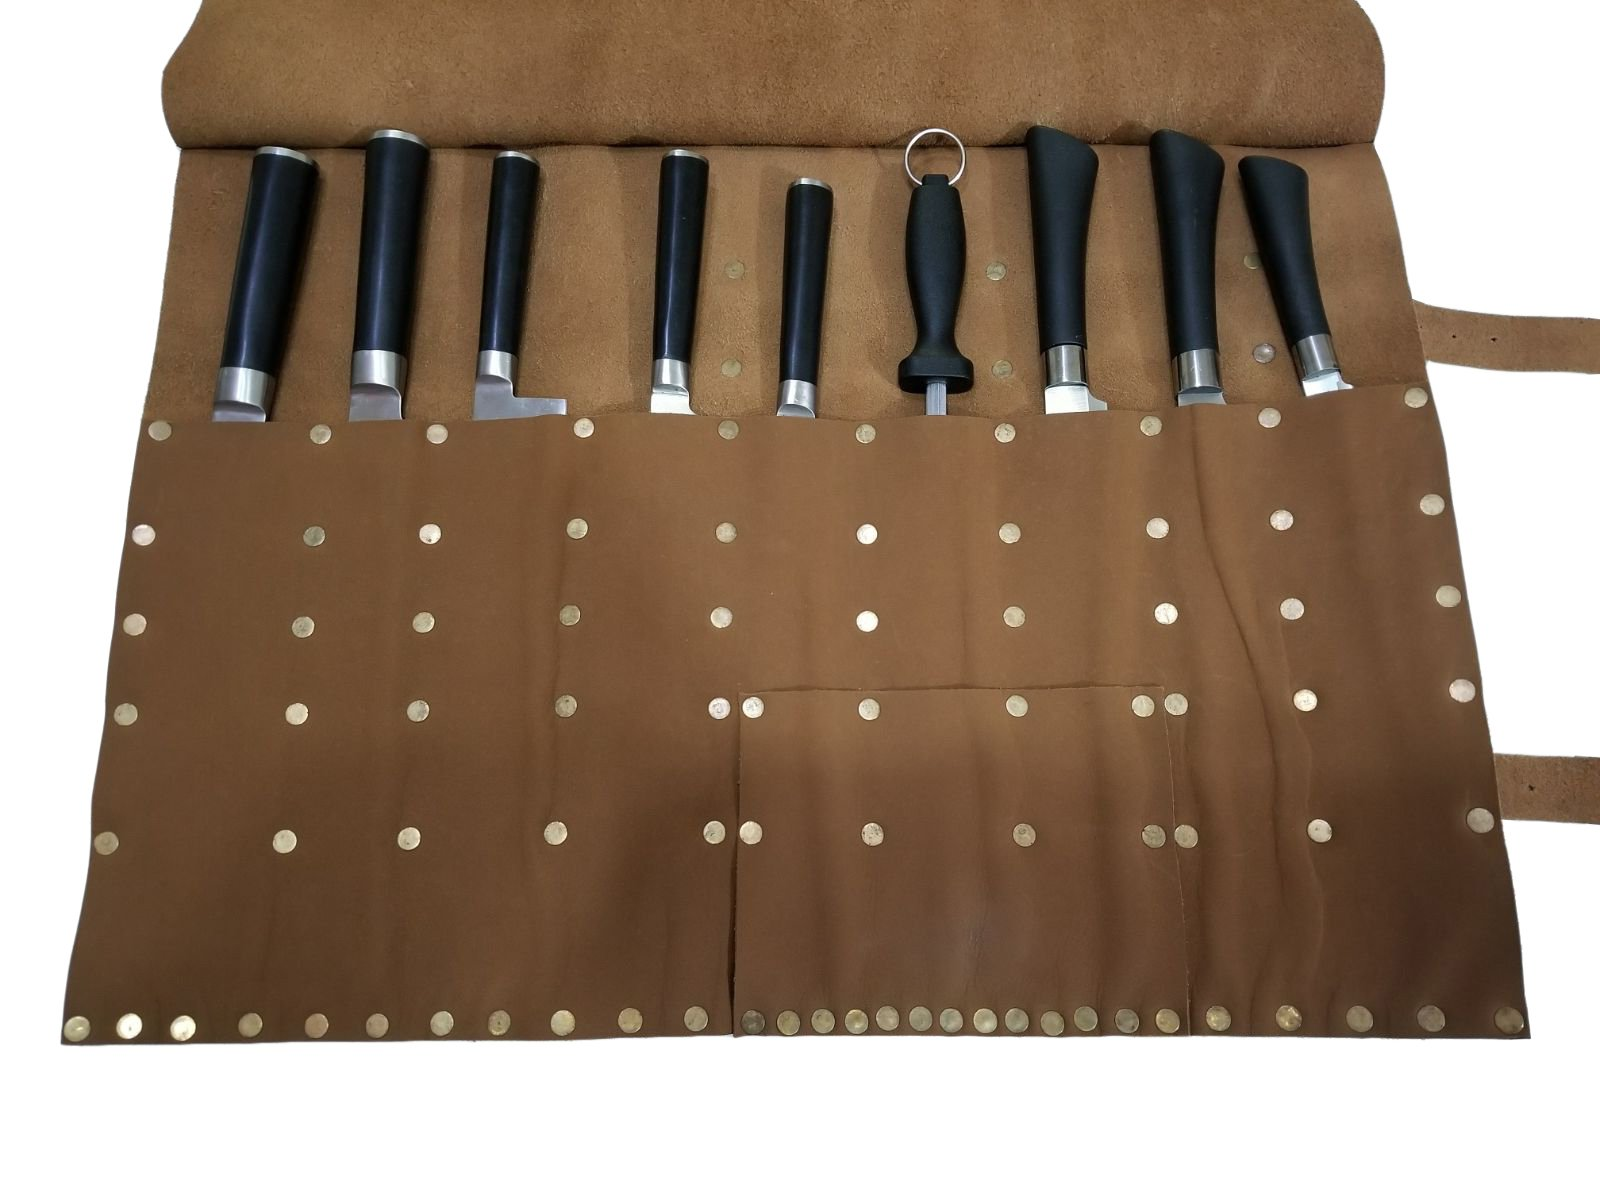 Professional Chef Bag Lightweight Genuine Premium VINTAGE TAN LEATHER 12 Pockets Knife Bag/Chef Knife Roll #011